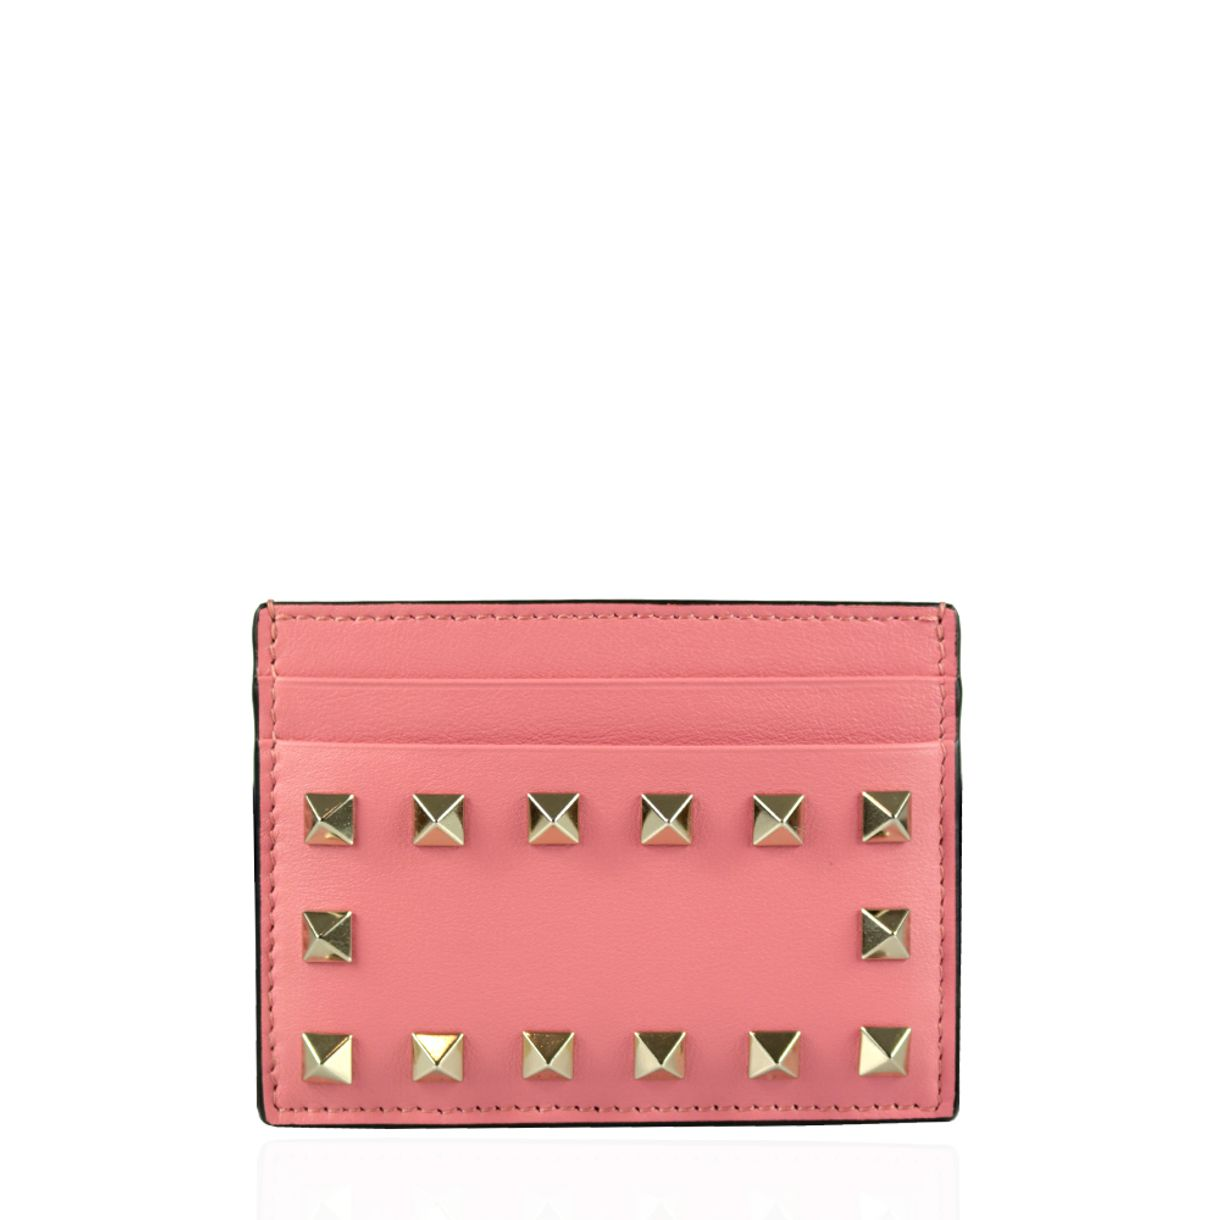 60957-Porta-Cartao-Valentino-Couro-Rosa-Rockstud